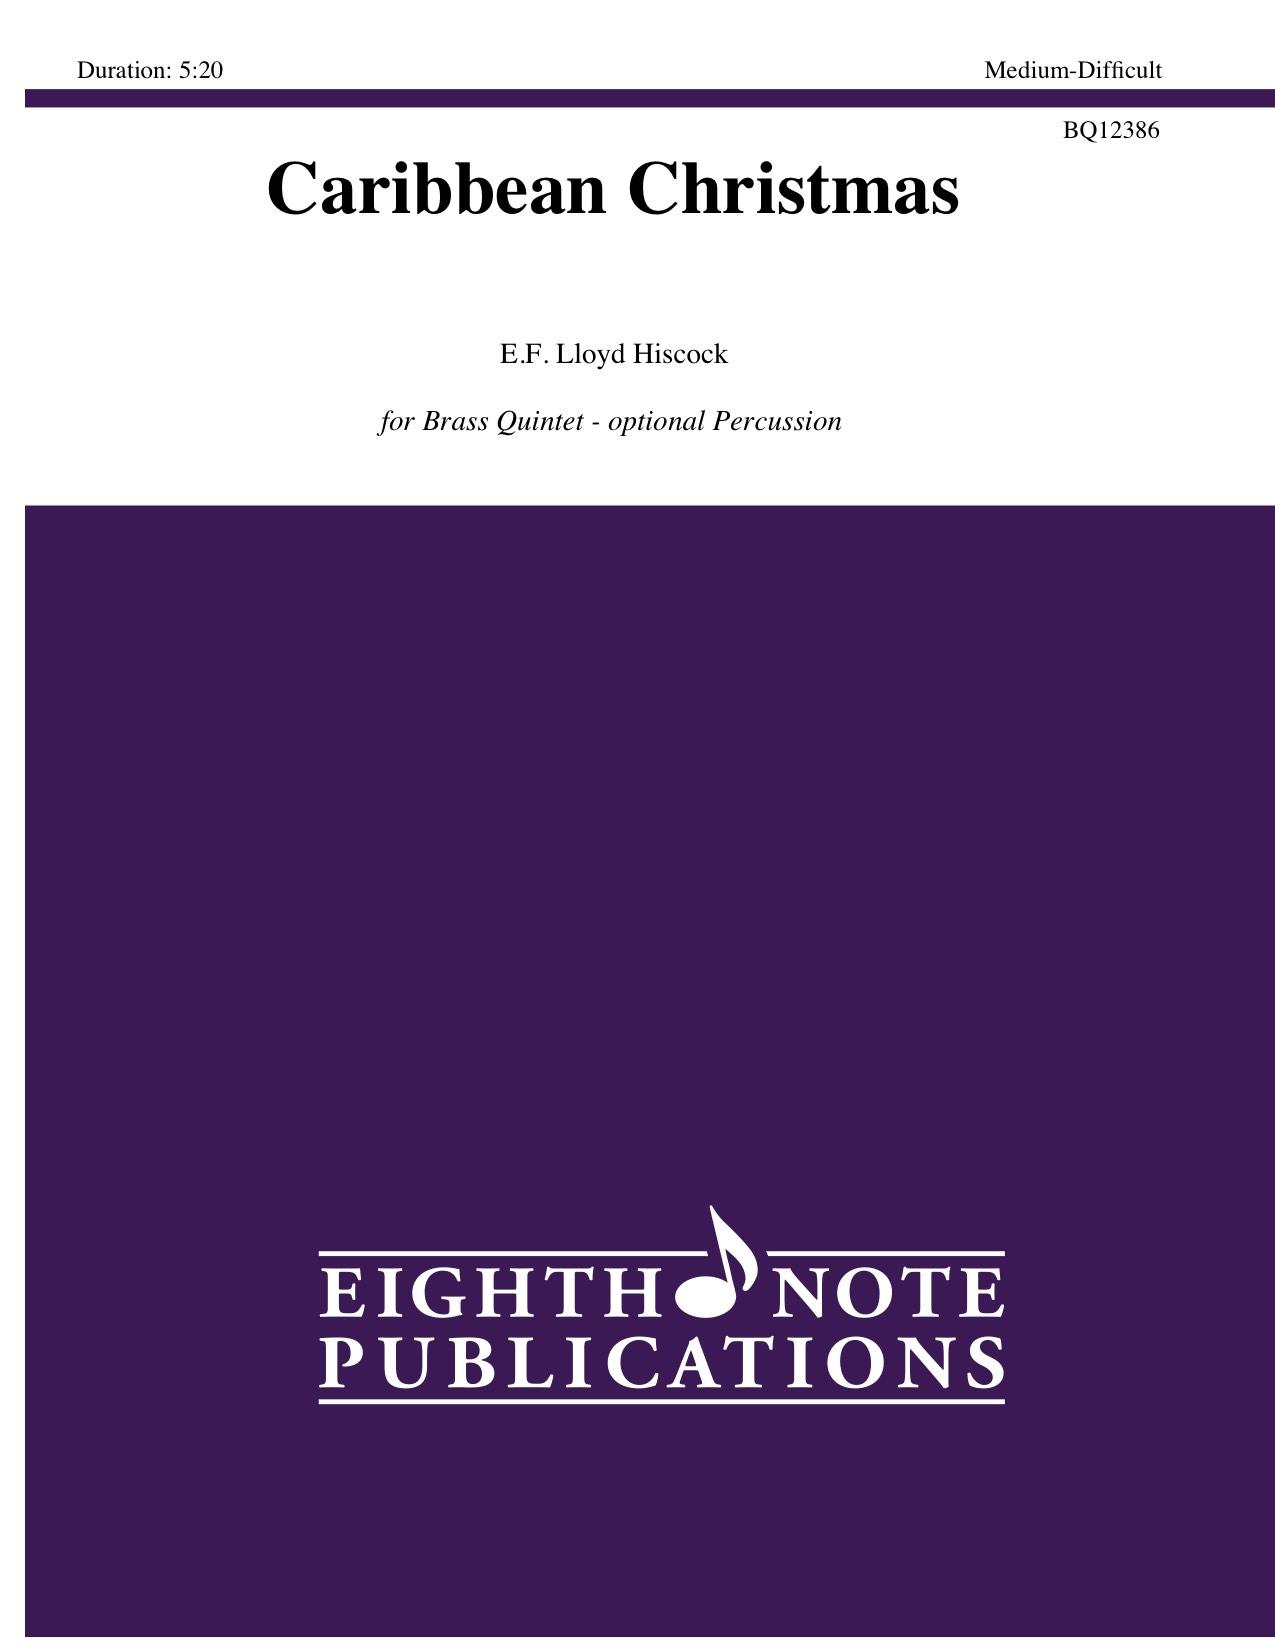 Caribbean Christmas - E.F. Lloyd Hiscock